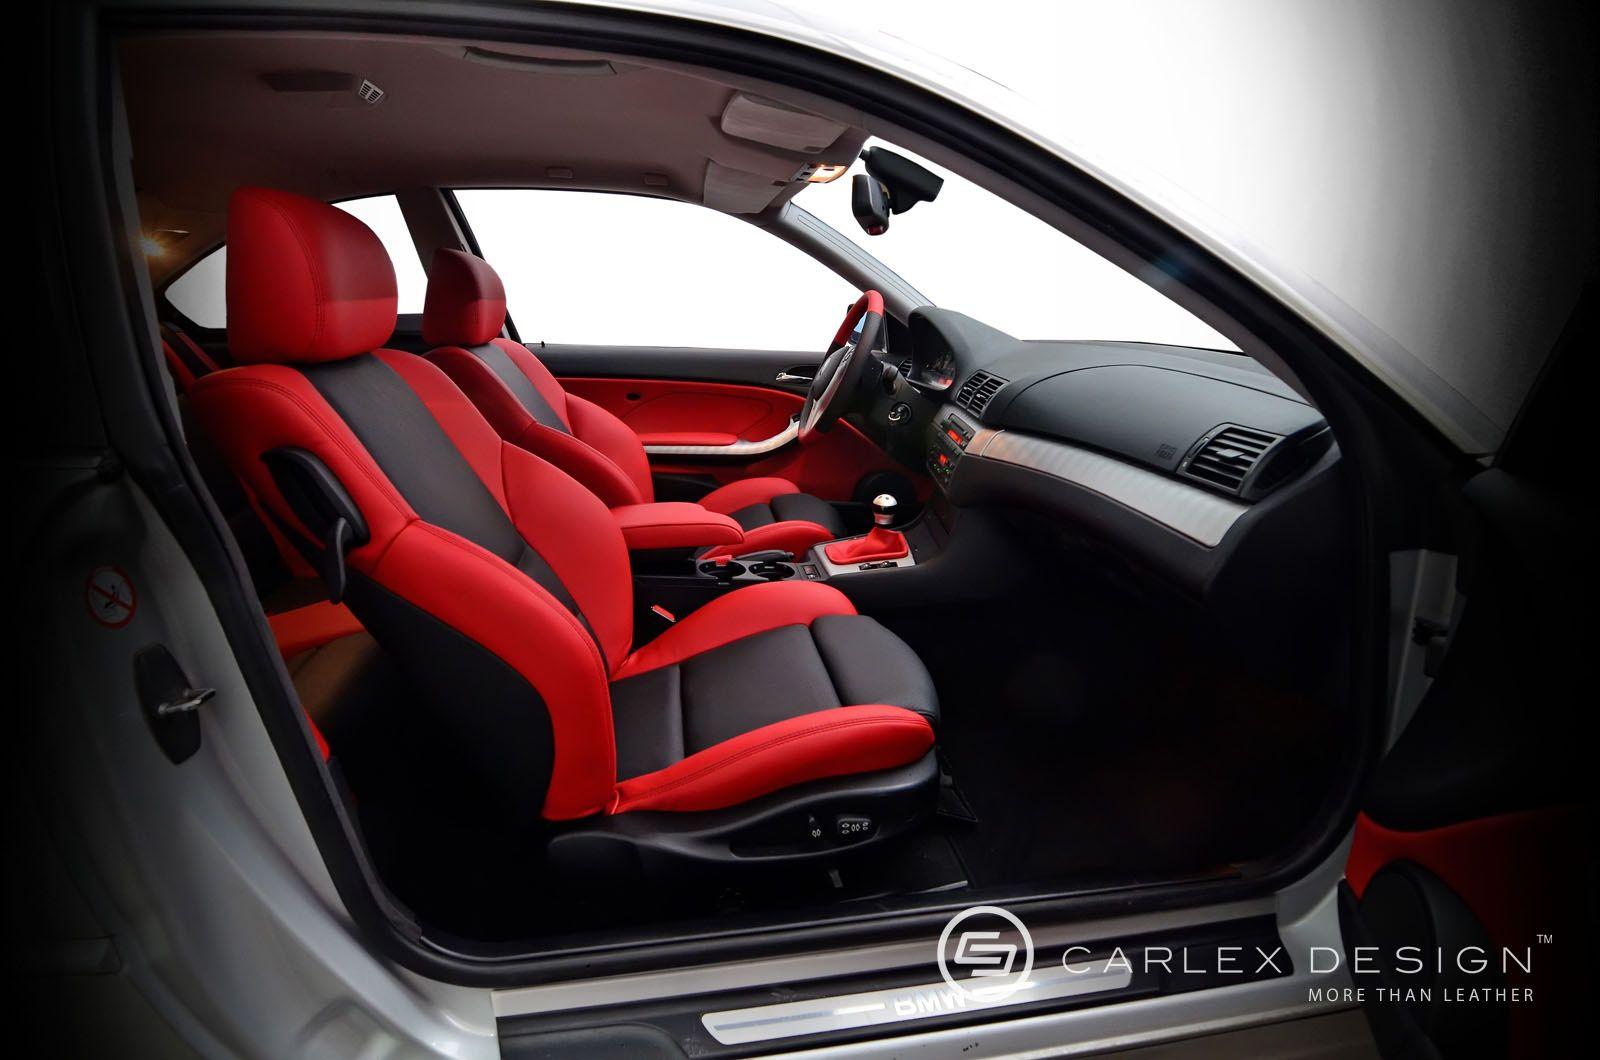 Bmw e46 silver 3 series custom interior red and black and grey awesome carlex design auto for Custom truck interior design